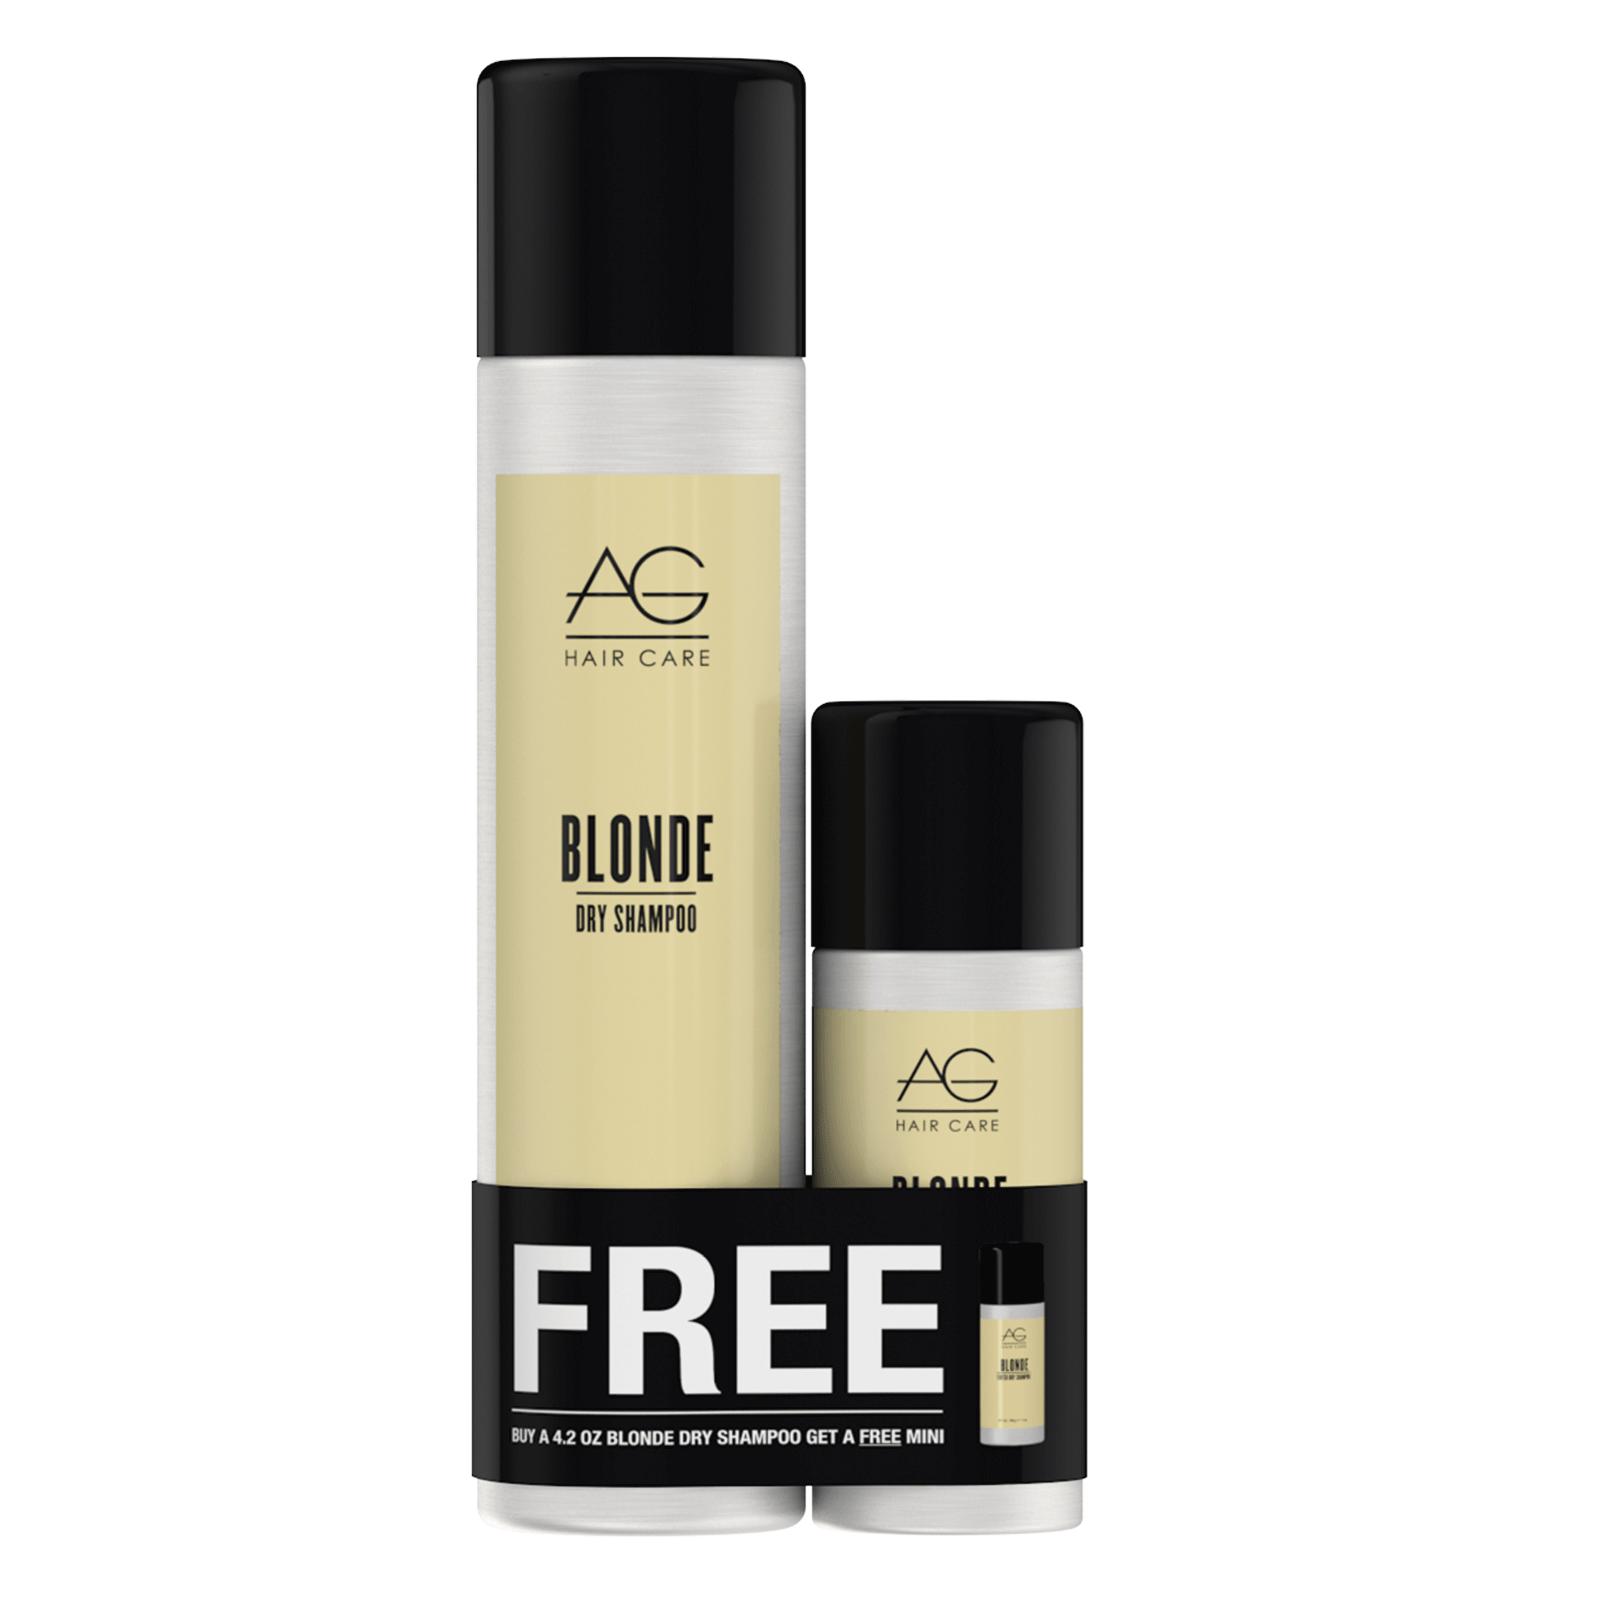 Blonde Dry Shampoo Duo - AG Hair | CosmoProf